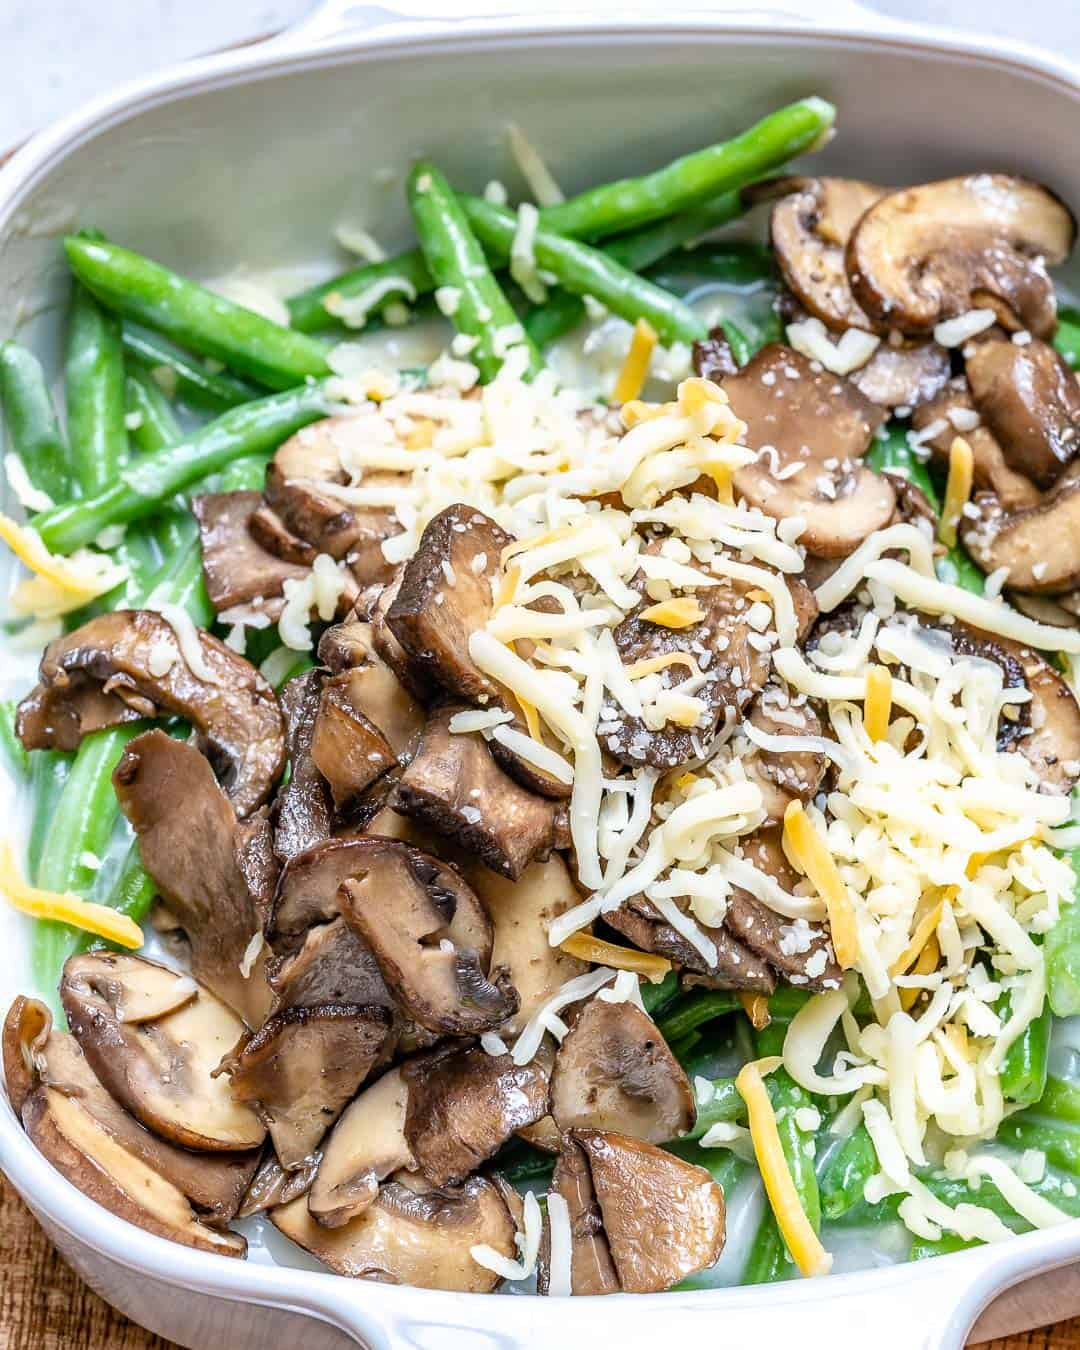 green beans, mushroom, and cheese